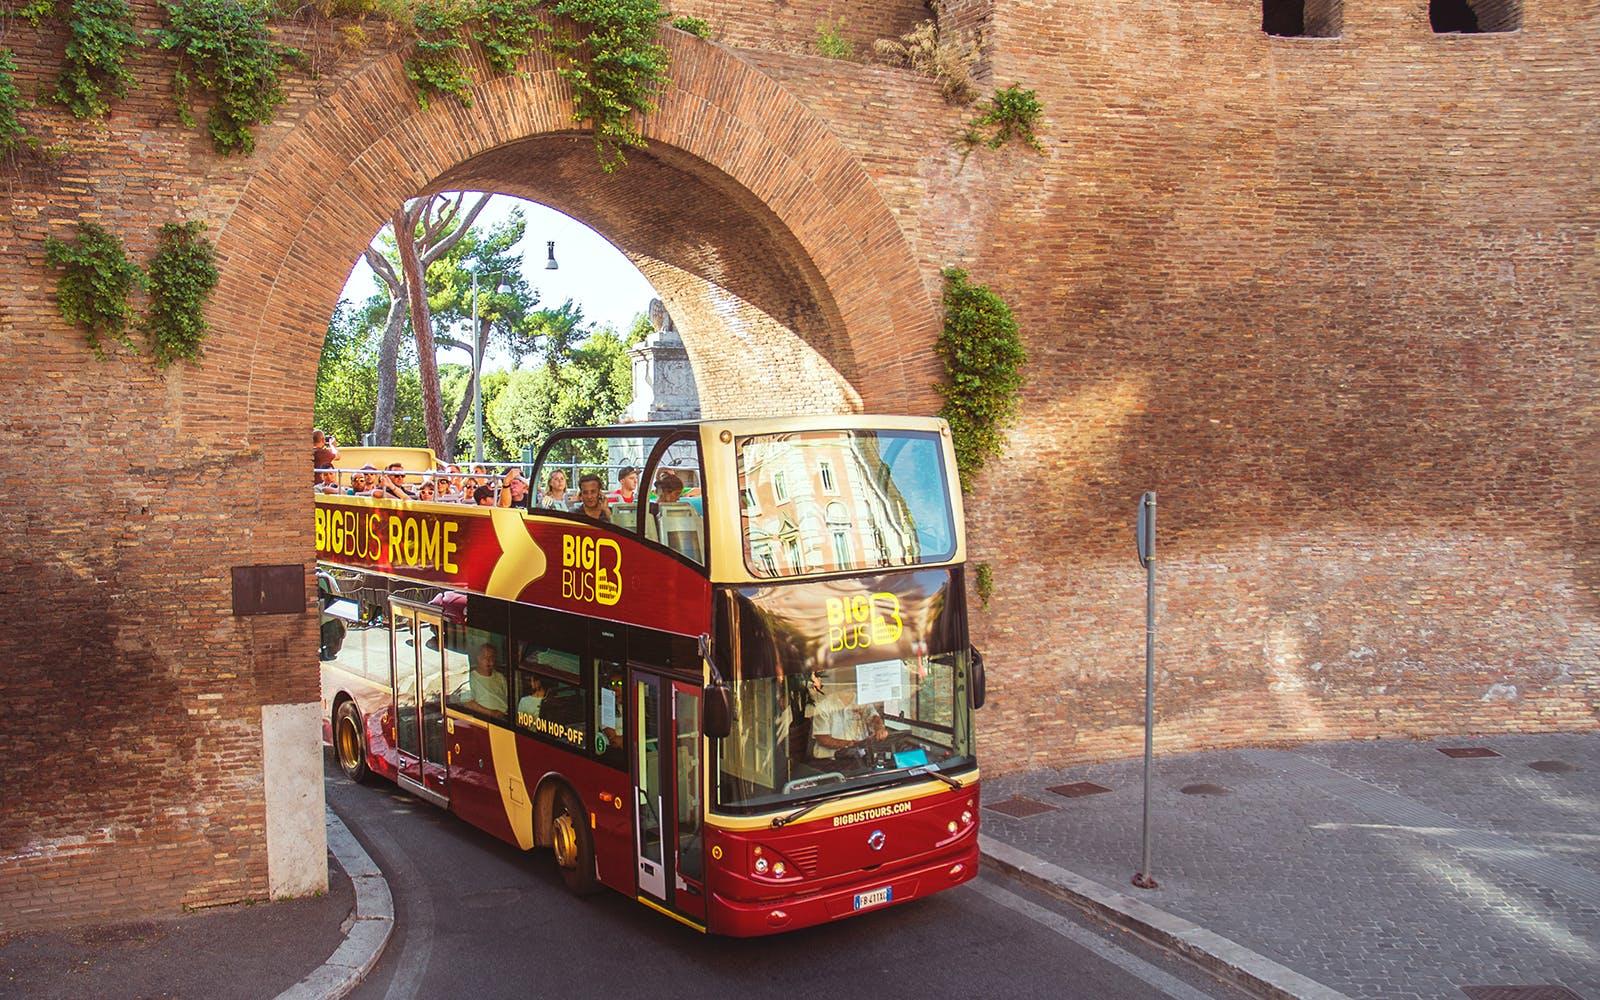 Big Bus Rome 3 days hop on hop off